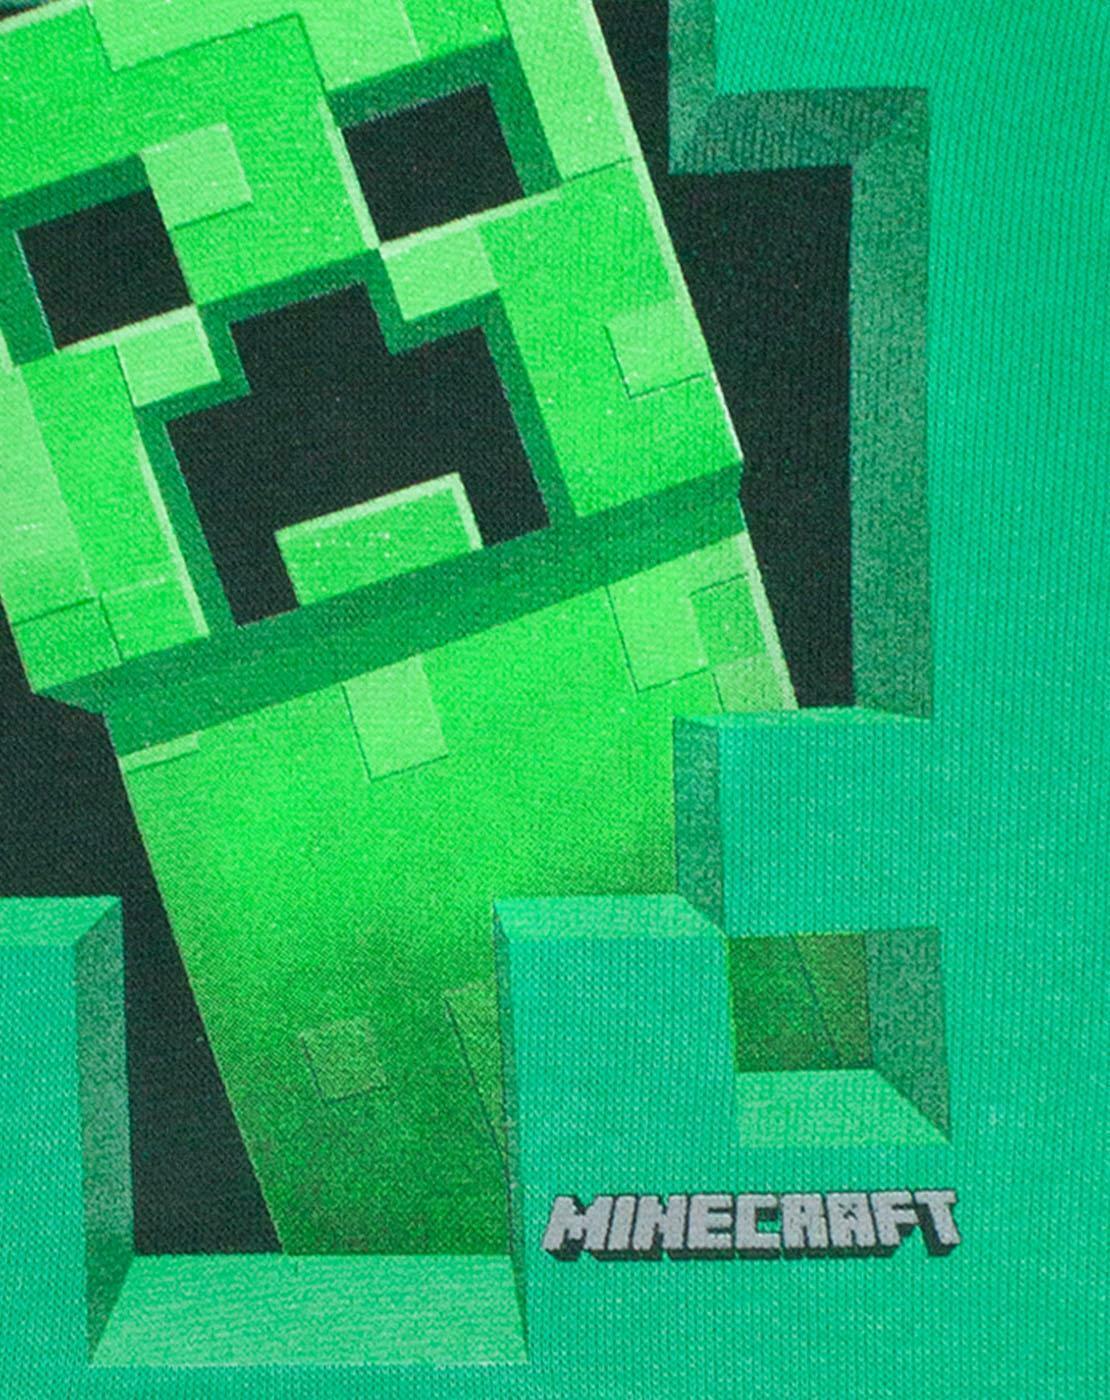 Minecraft-Green-Creeper-Boys-Hoodie-Kids-Long-Sleeve-Hooded-Sweater thumbnail 8